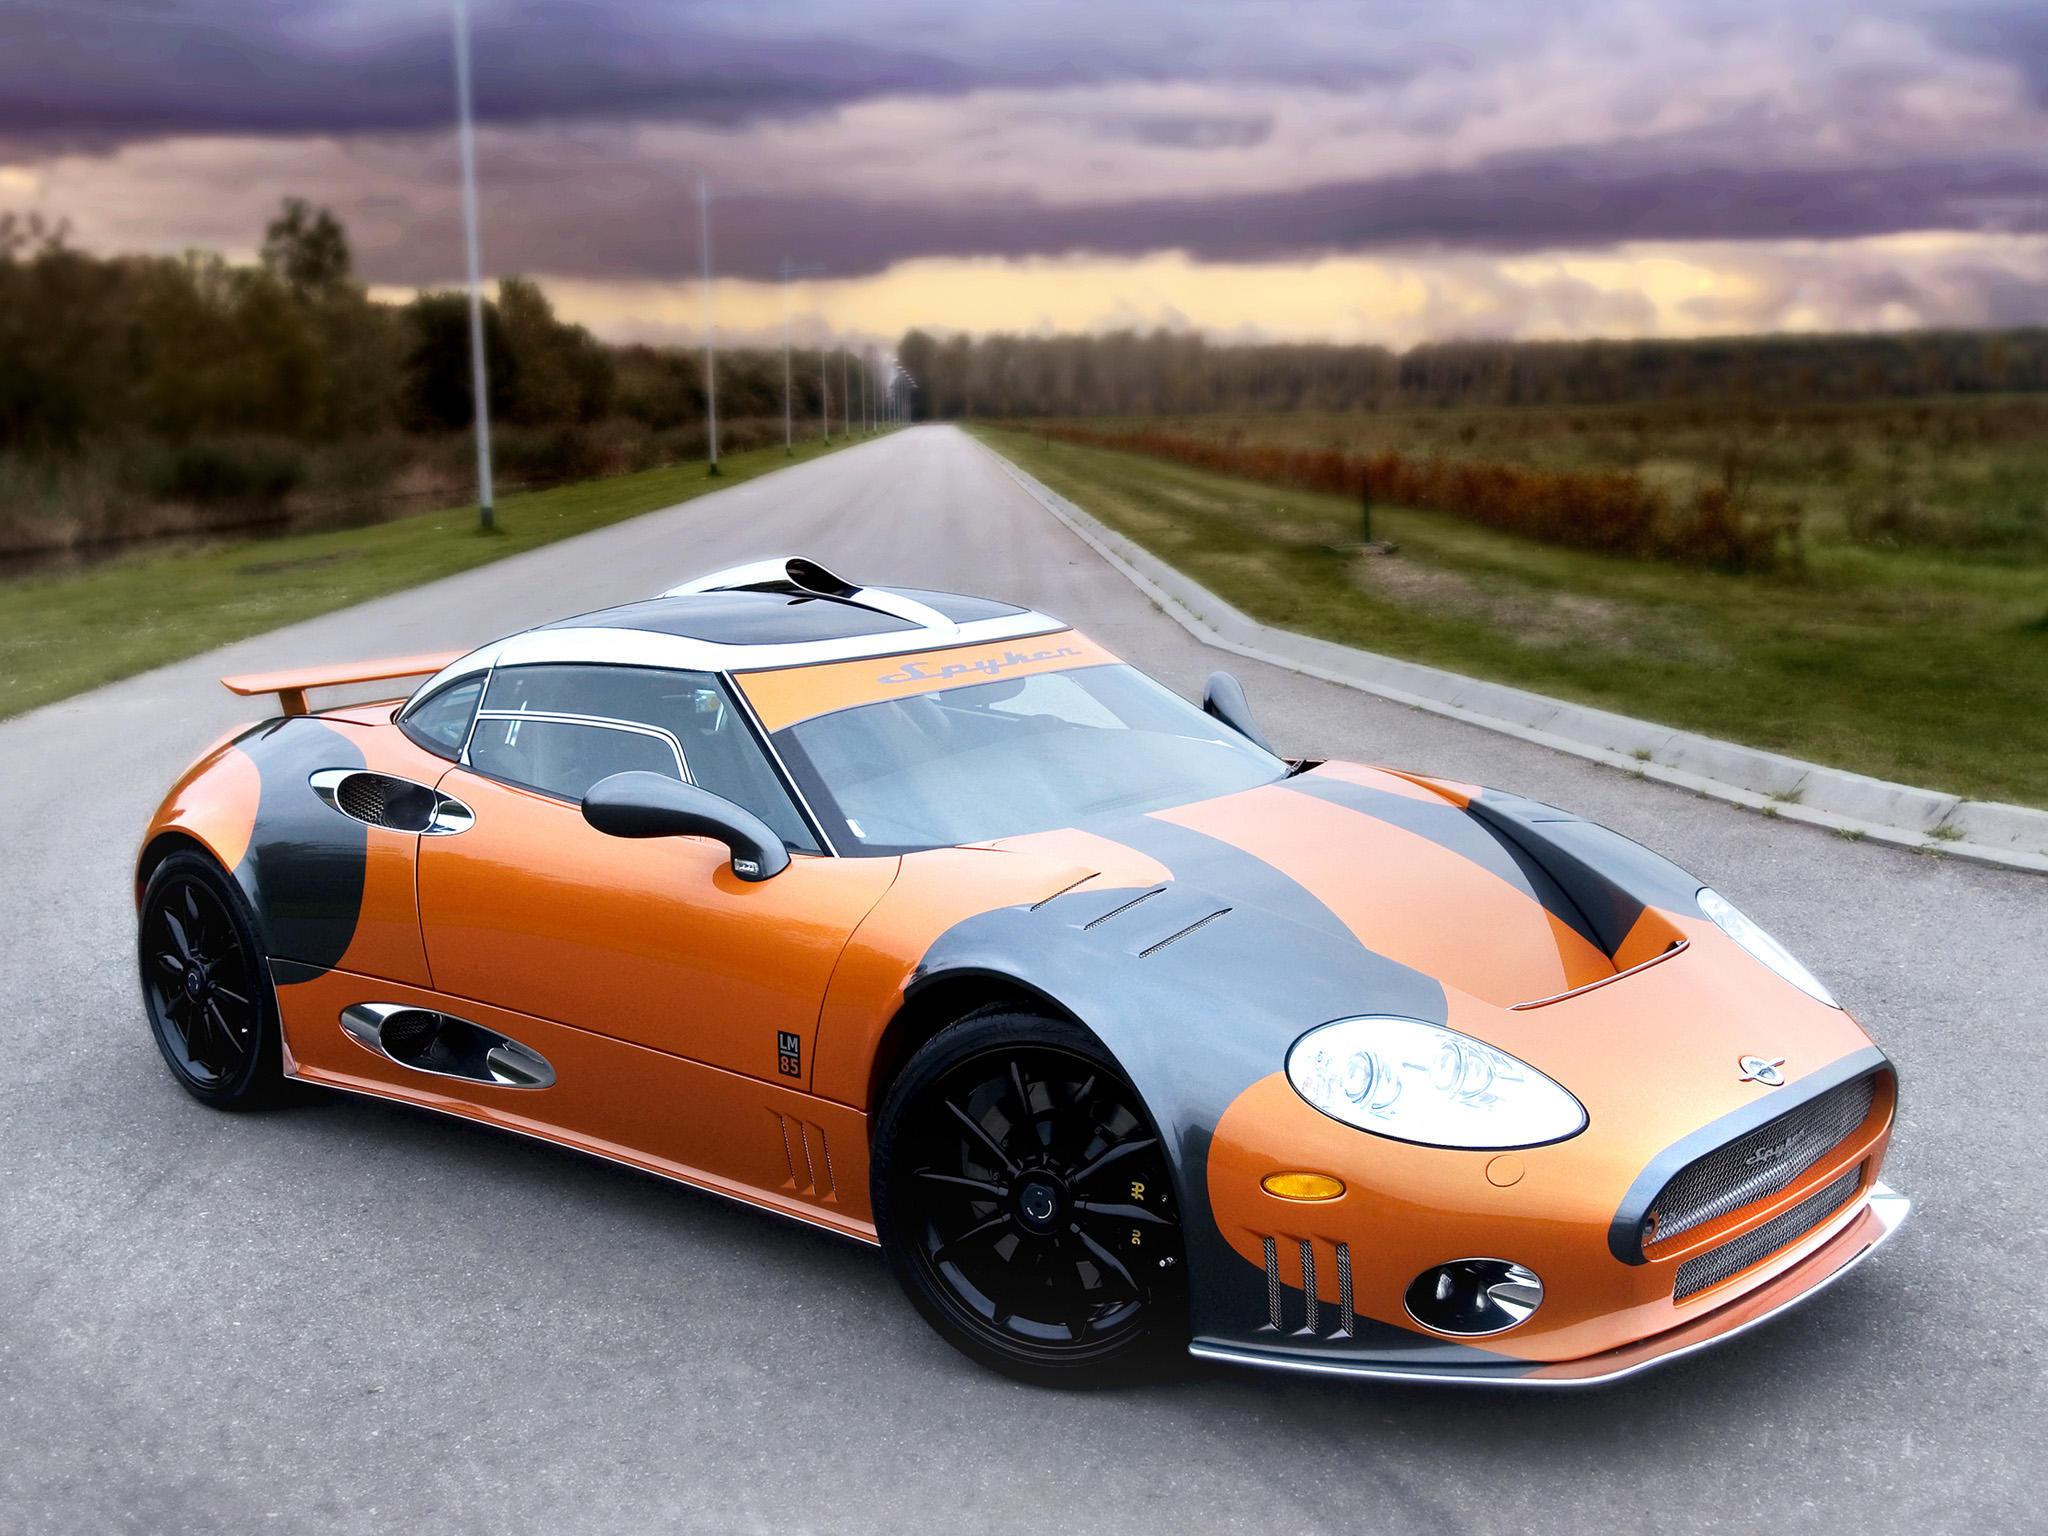 Обои Spyker, автомобиль, дорога